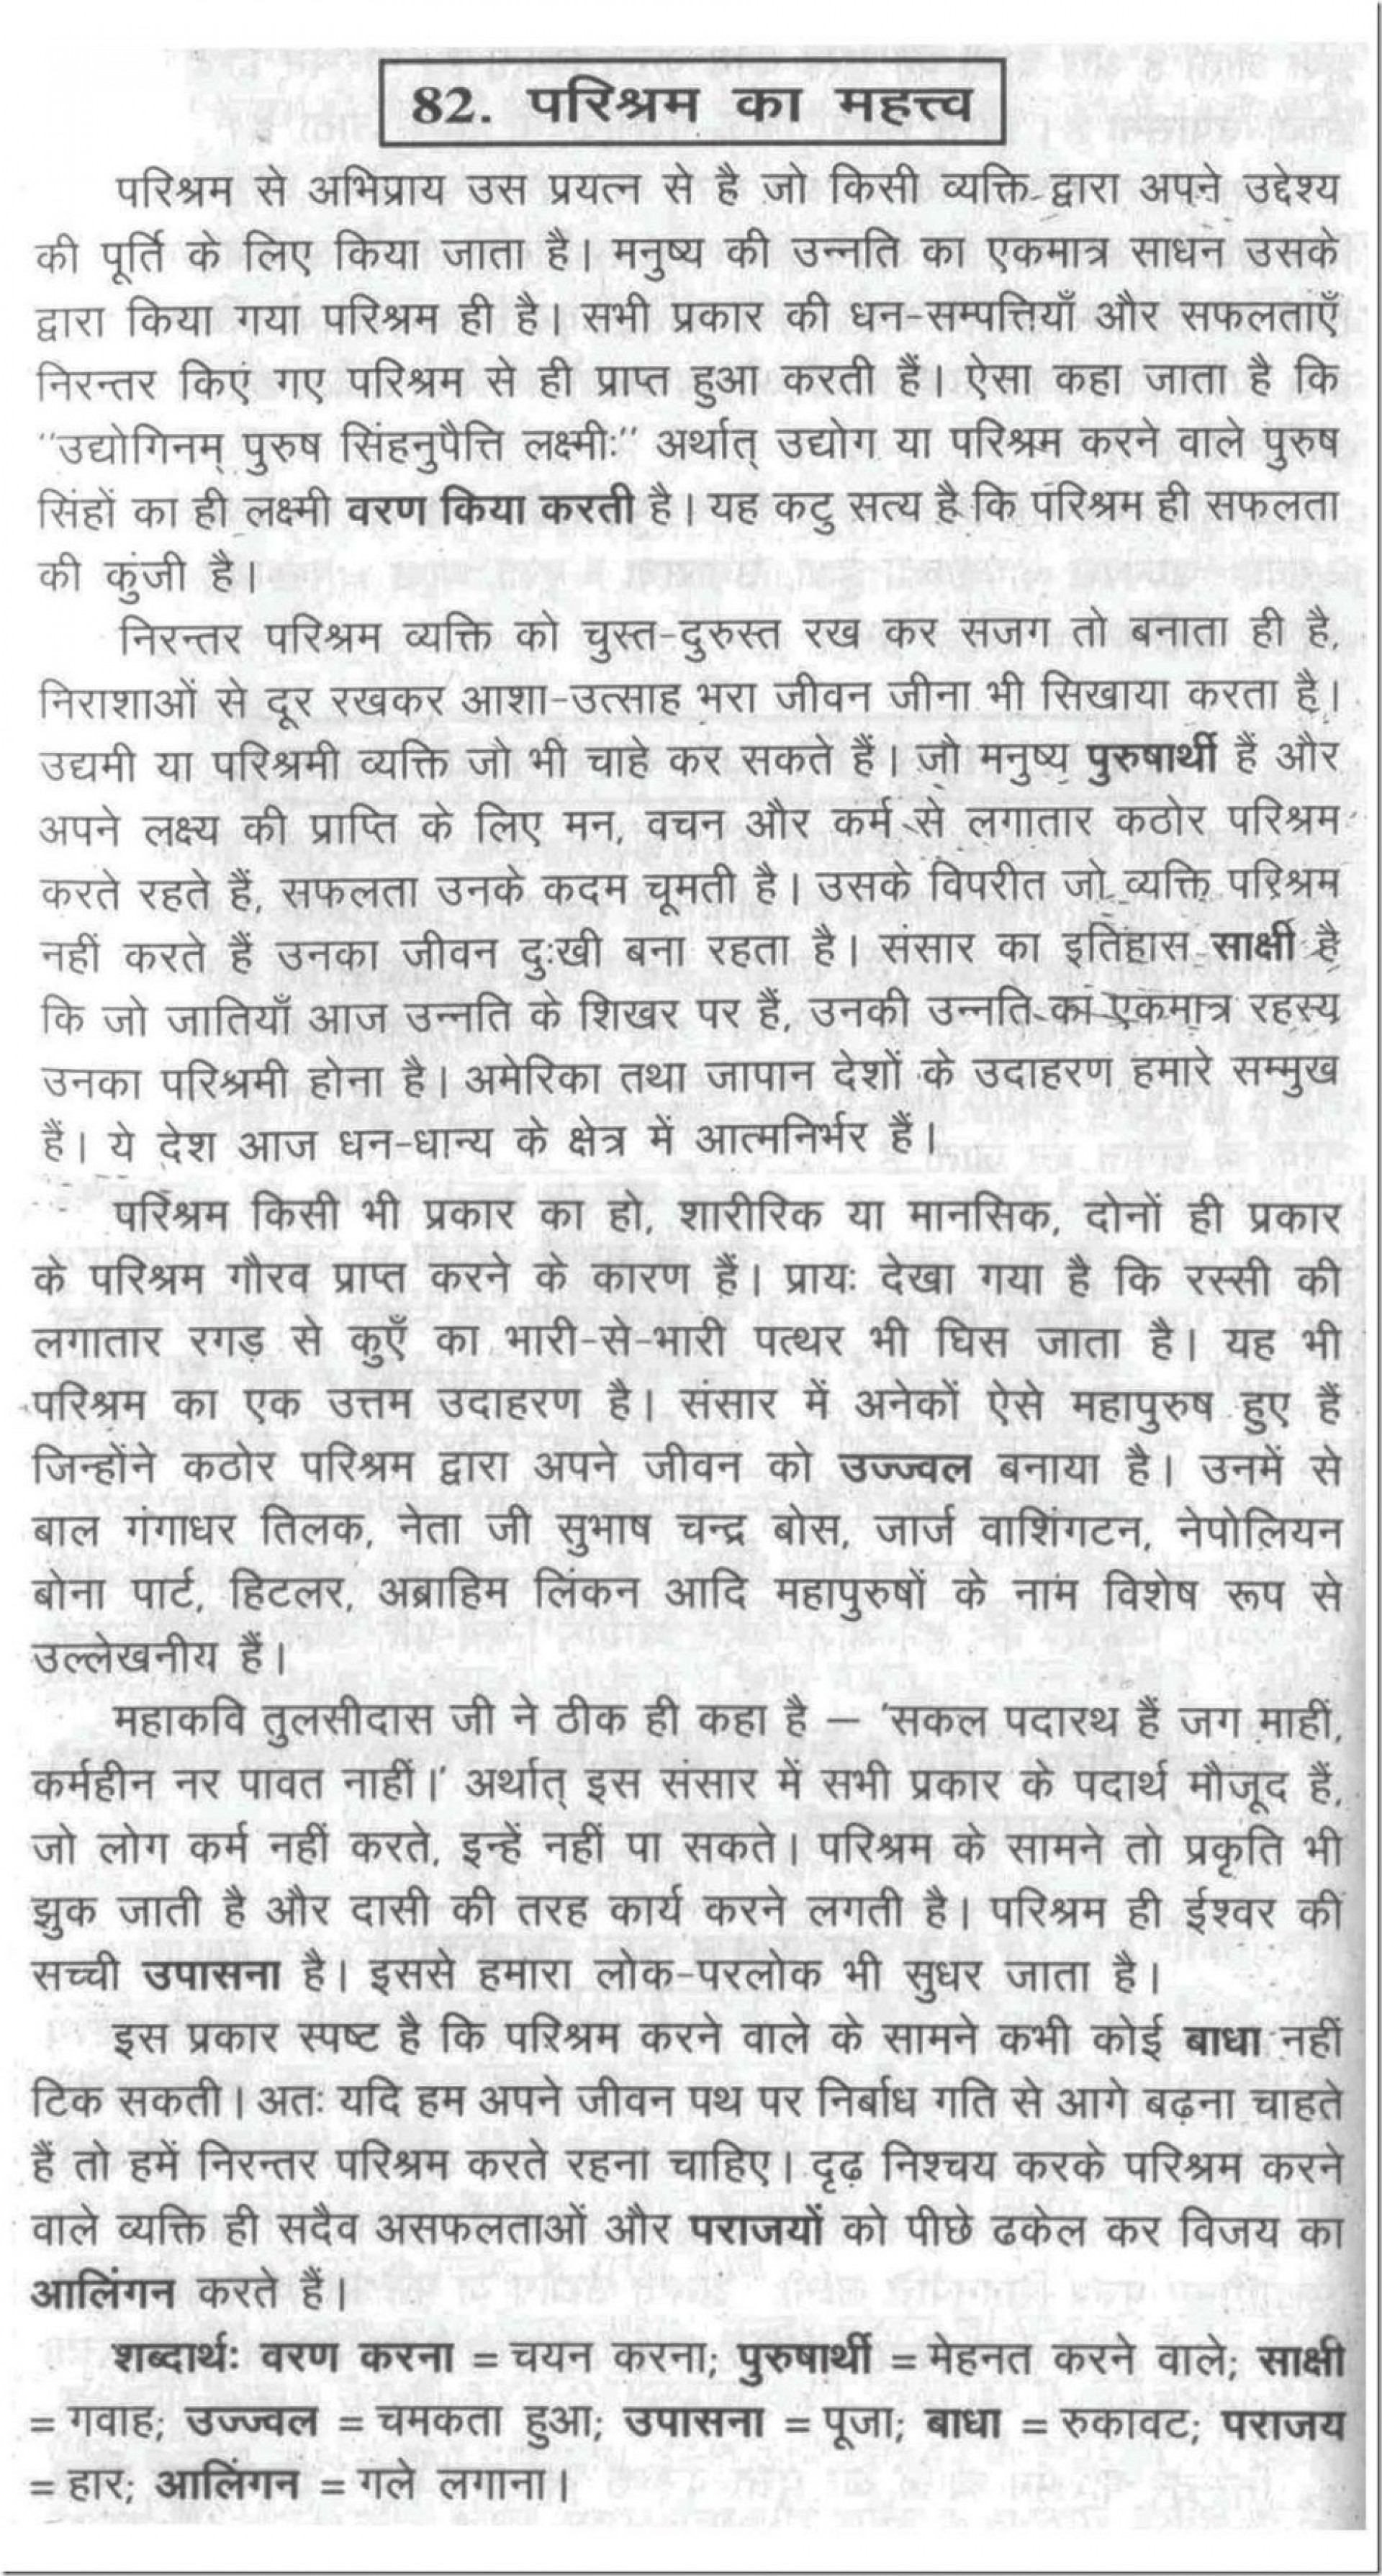 009 Hard Work Essay Thumb On Importance Of Hardwork In Hindi Urdu And Success Determination An Marathi English Is Key To Social Welfare Discourages Language The Punjabi 936x1745 Wonderful Example 1920